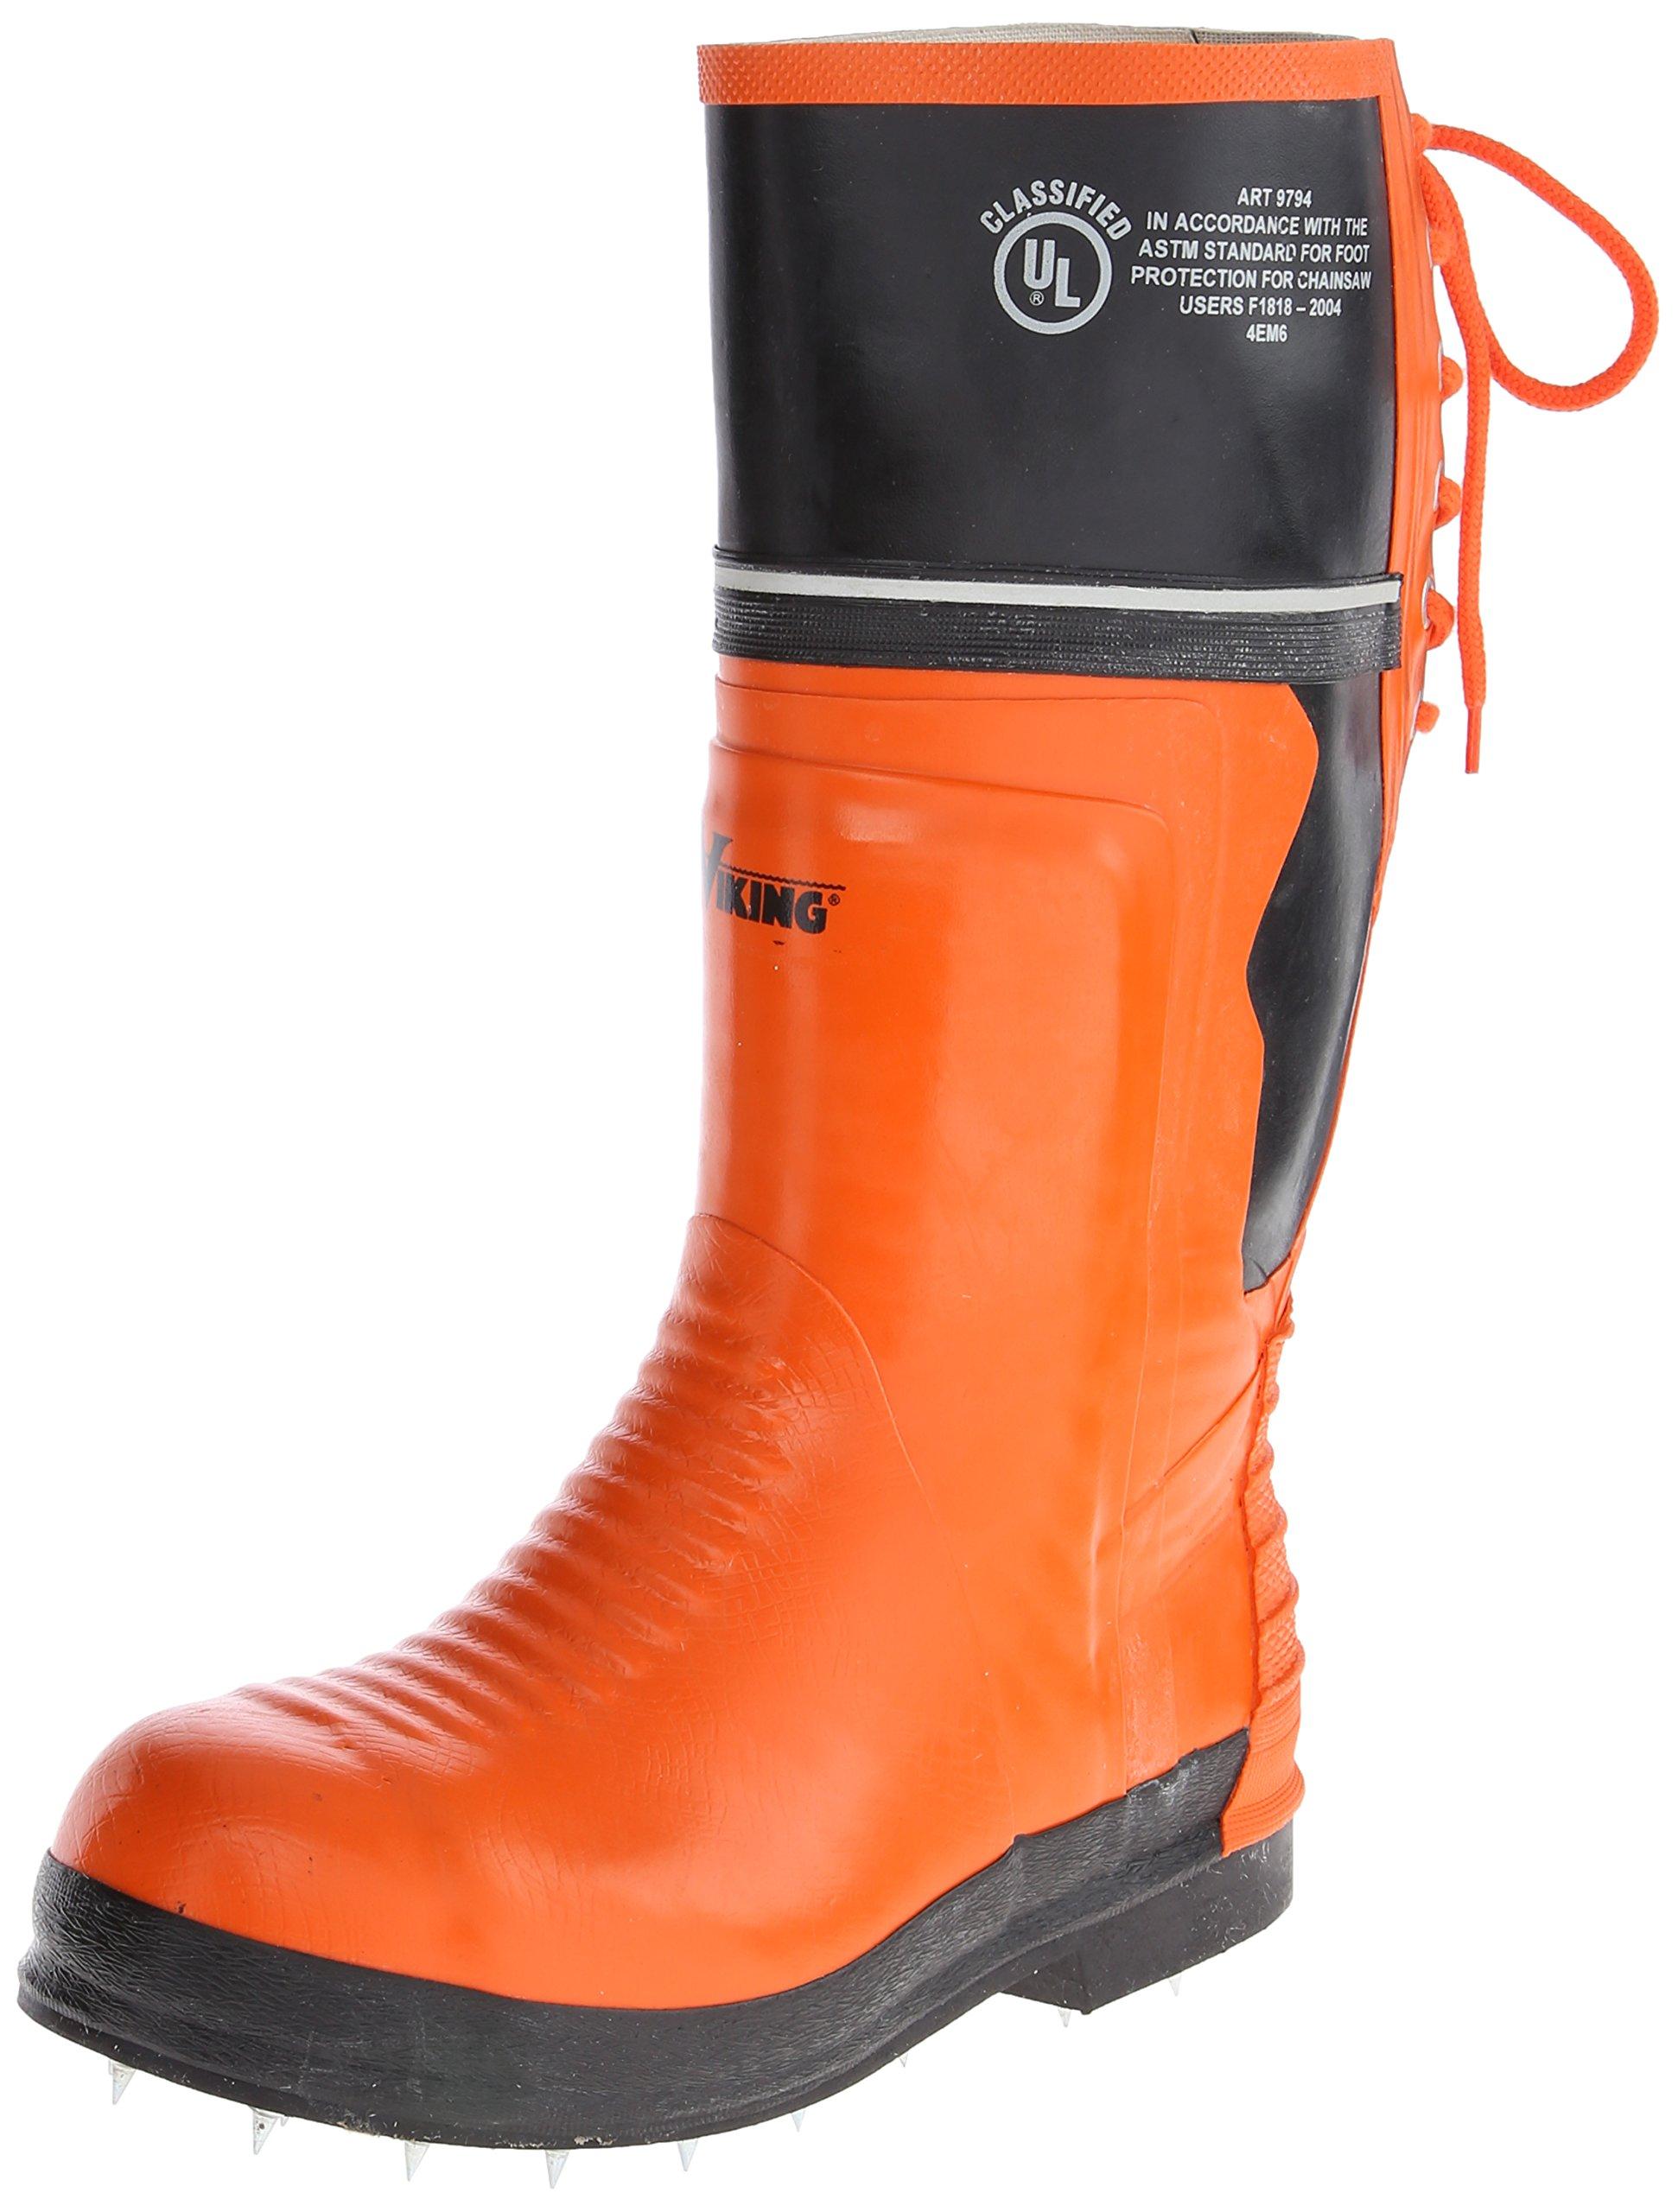 Viking Footwear Class 2 Chainsaw Caulked Boot,Orange/Black,10 M US by Viking Footwear